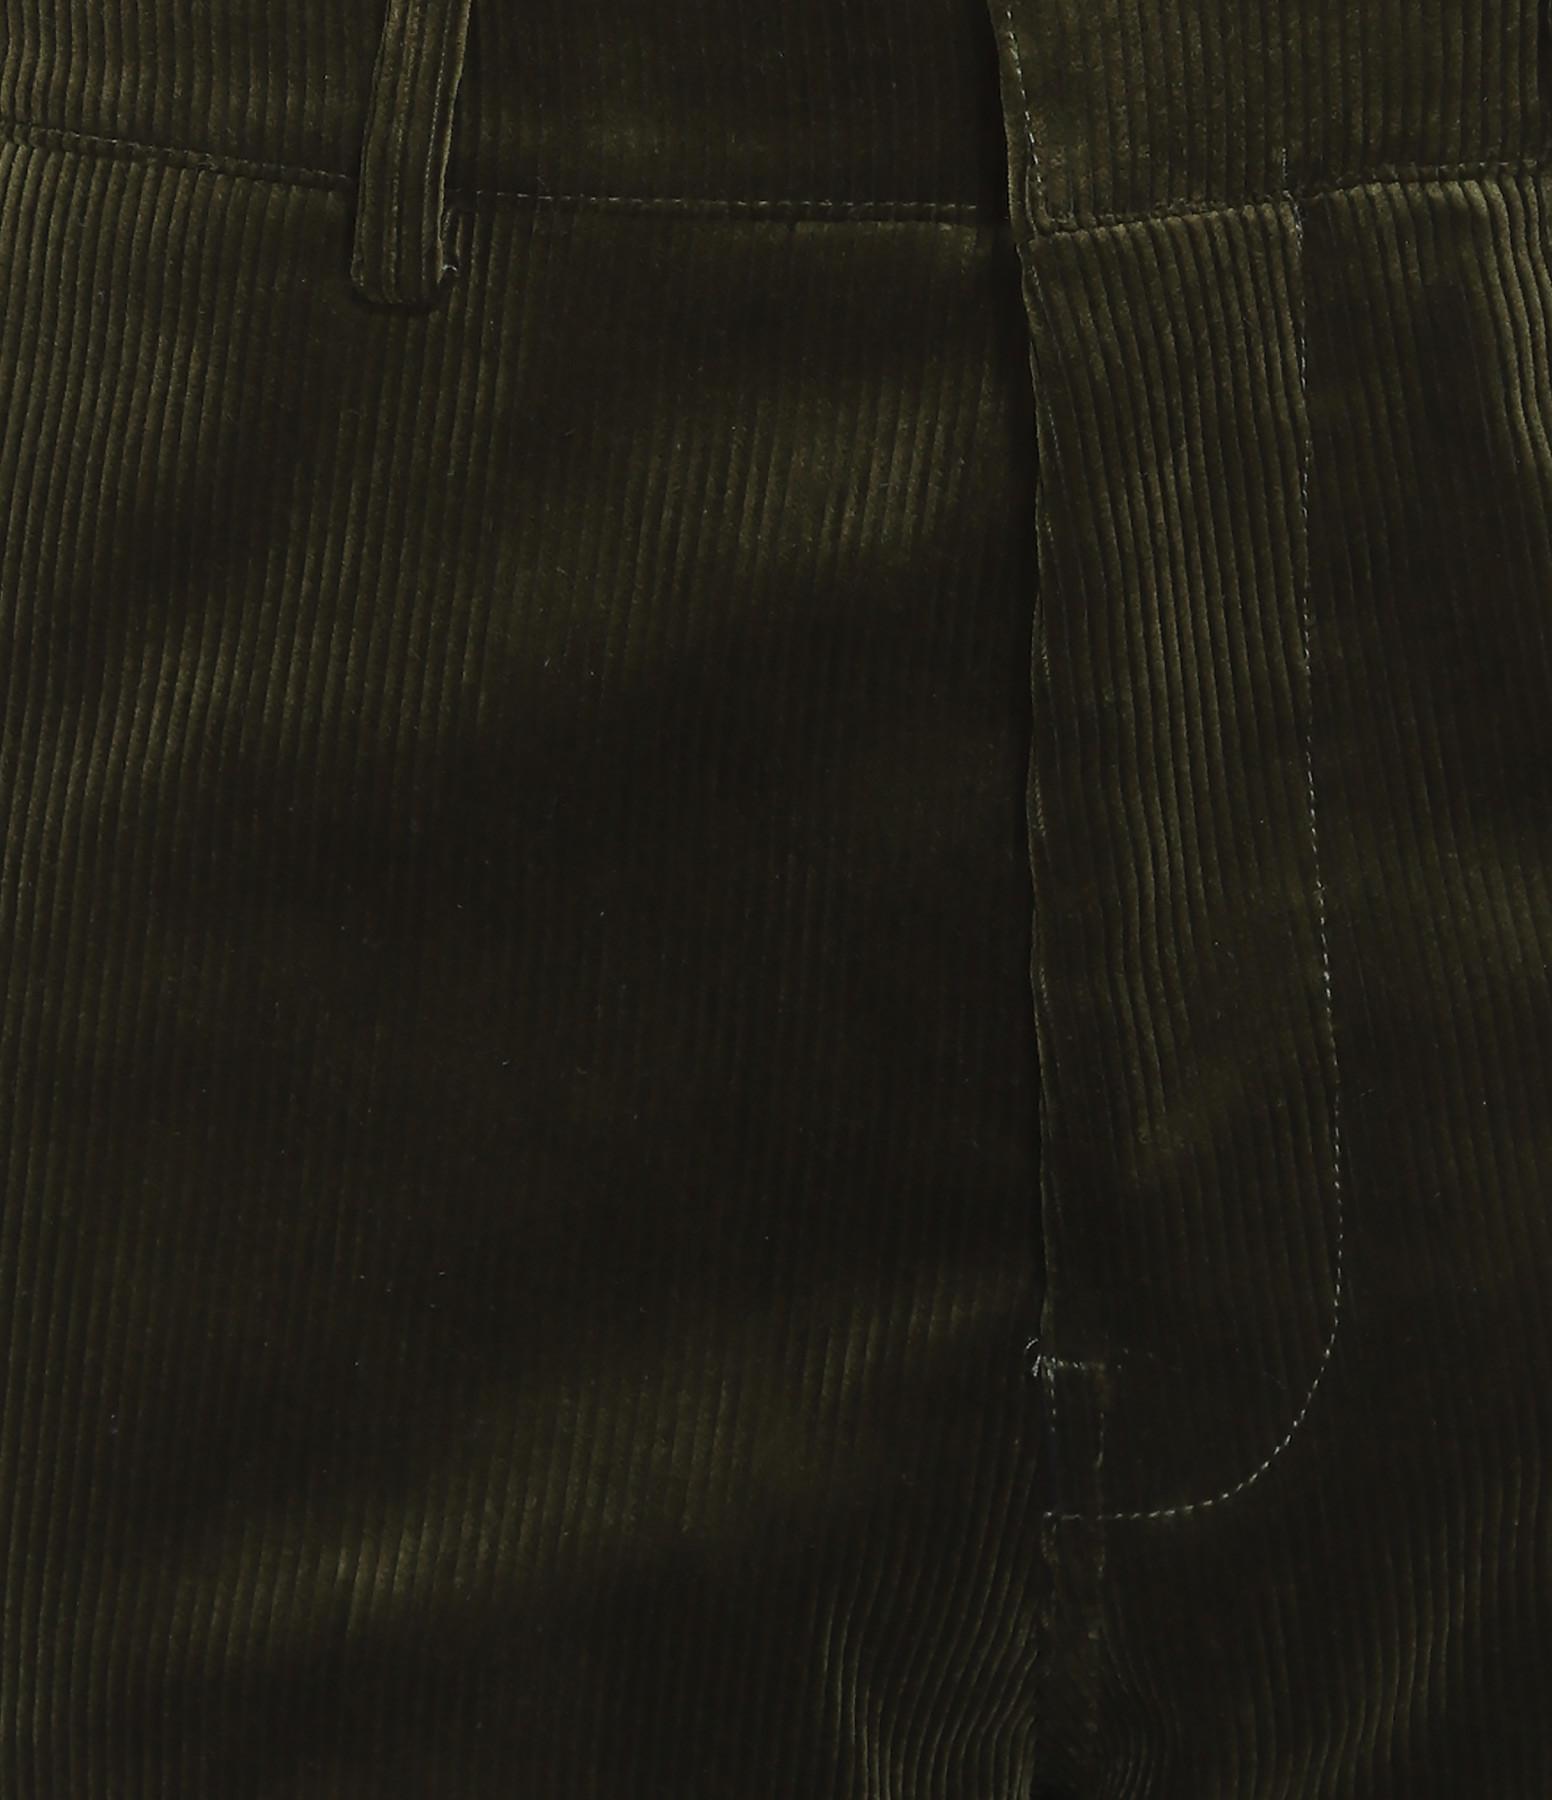 GOLDEN GOOSE - Pantalon Homme Chino Velours Côtelé Vert